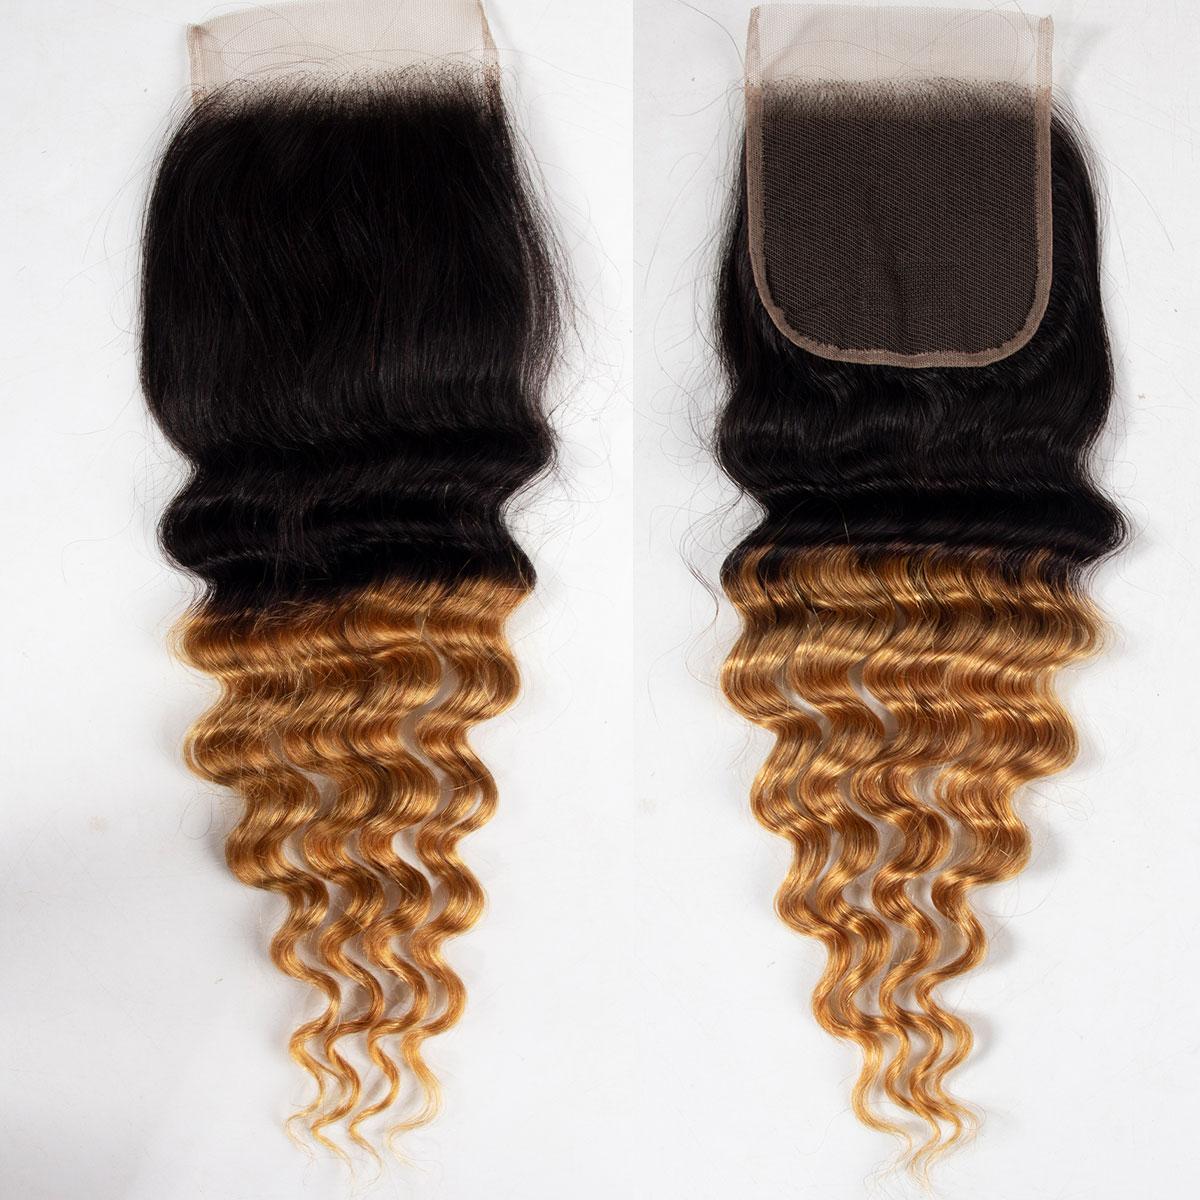 tinashe hair 1b 27 loose deep closure